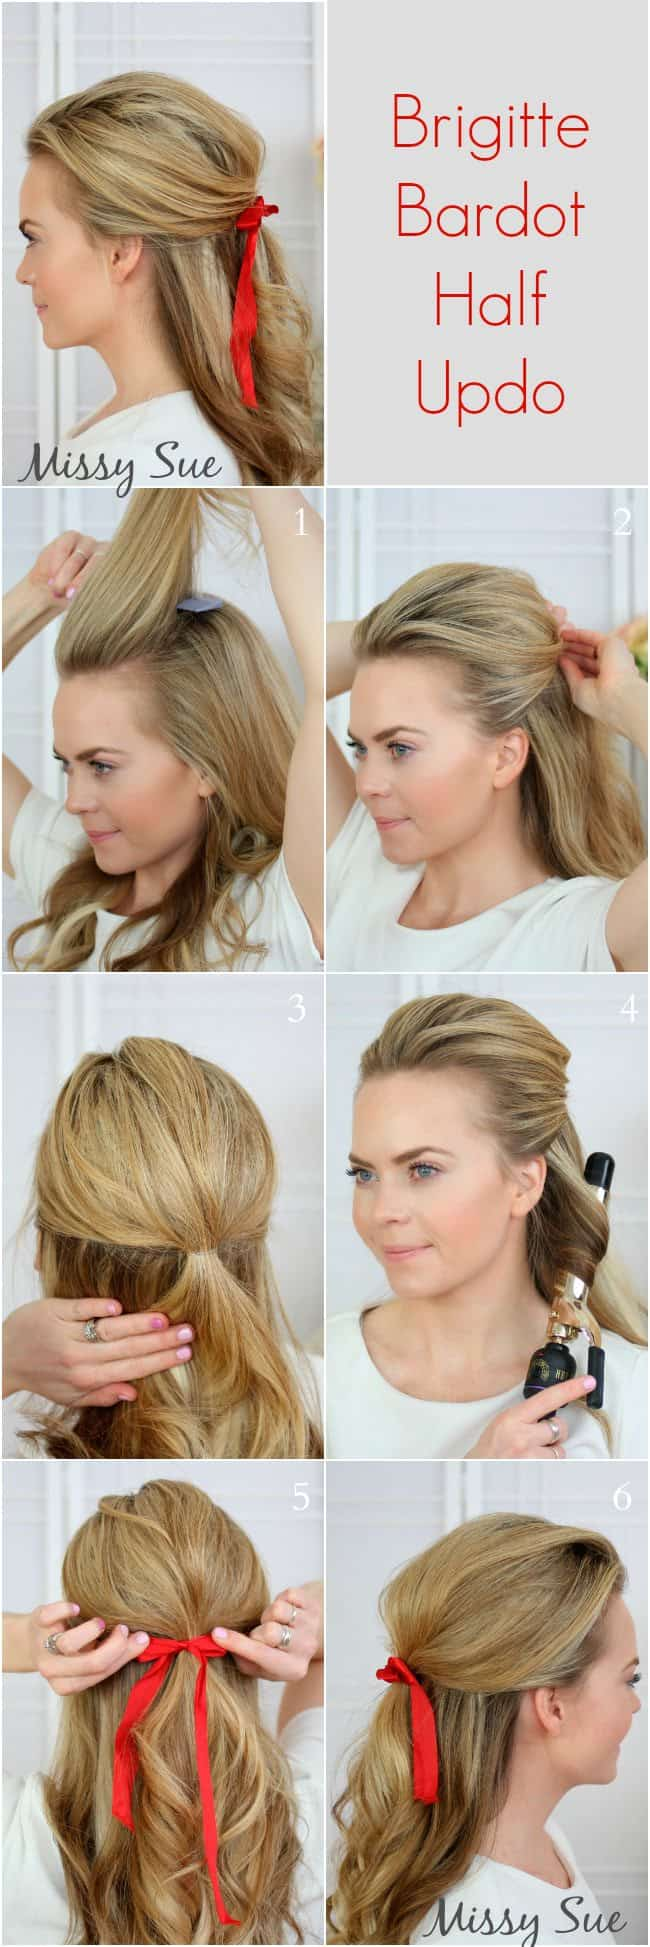 tutorial-penteado-1